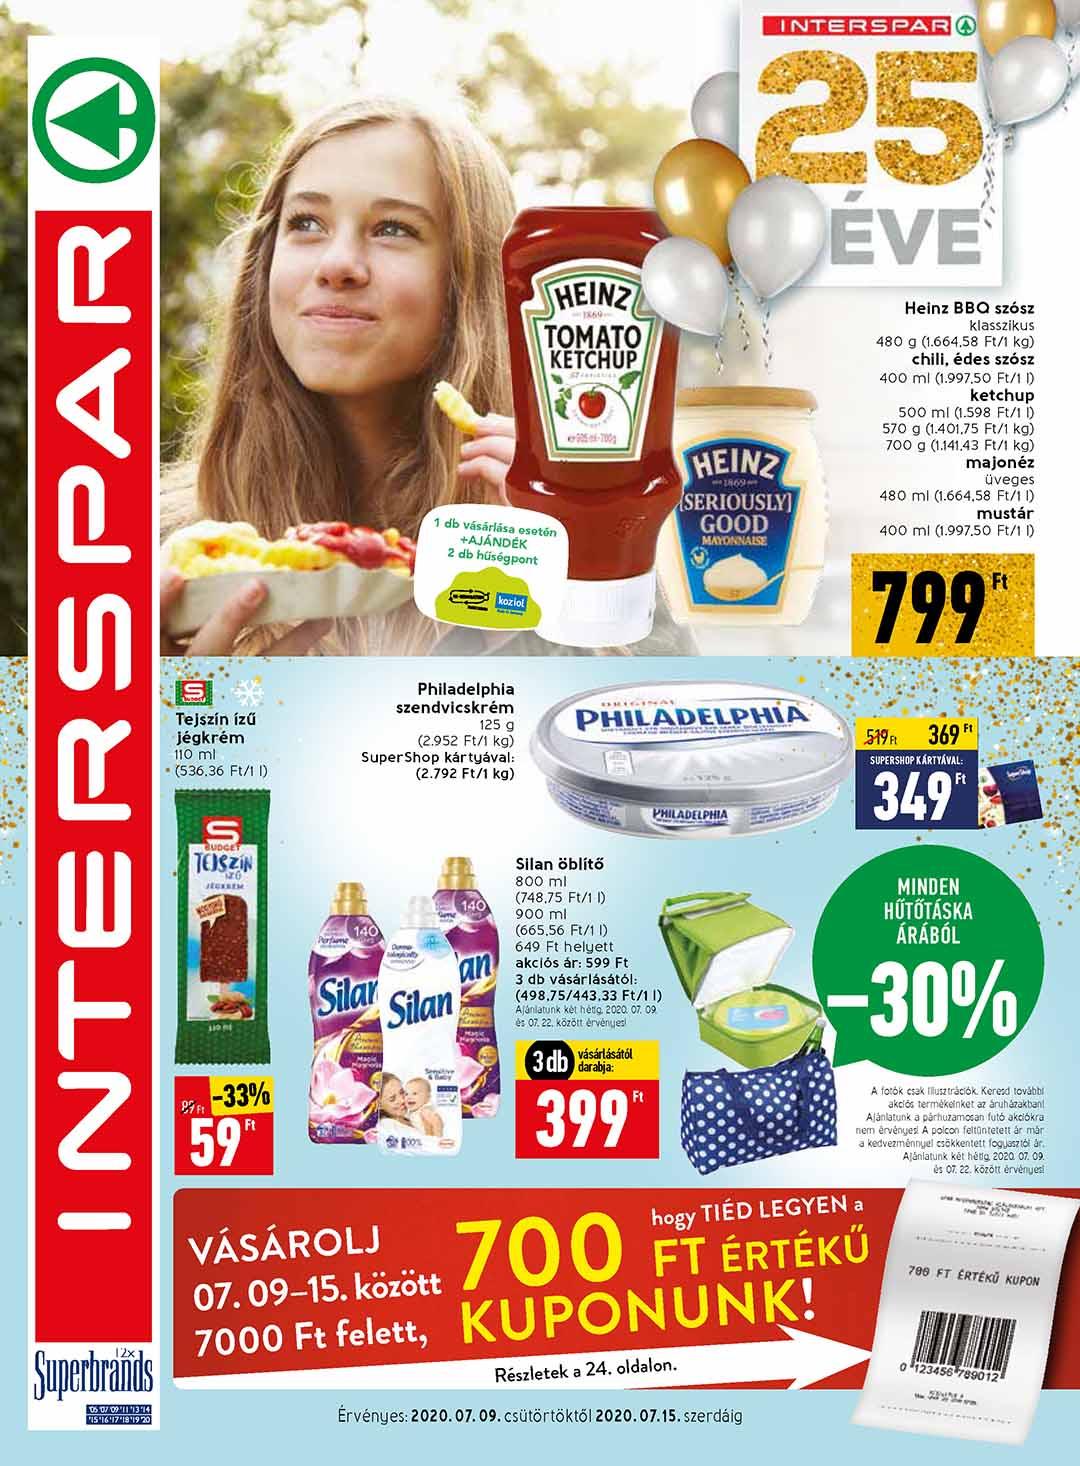 Interspar akciós újság 2020. 07.09-07.15